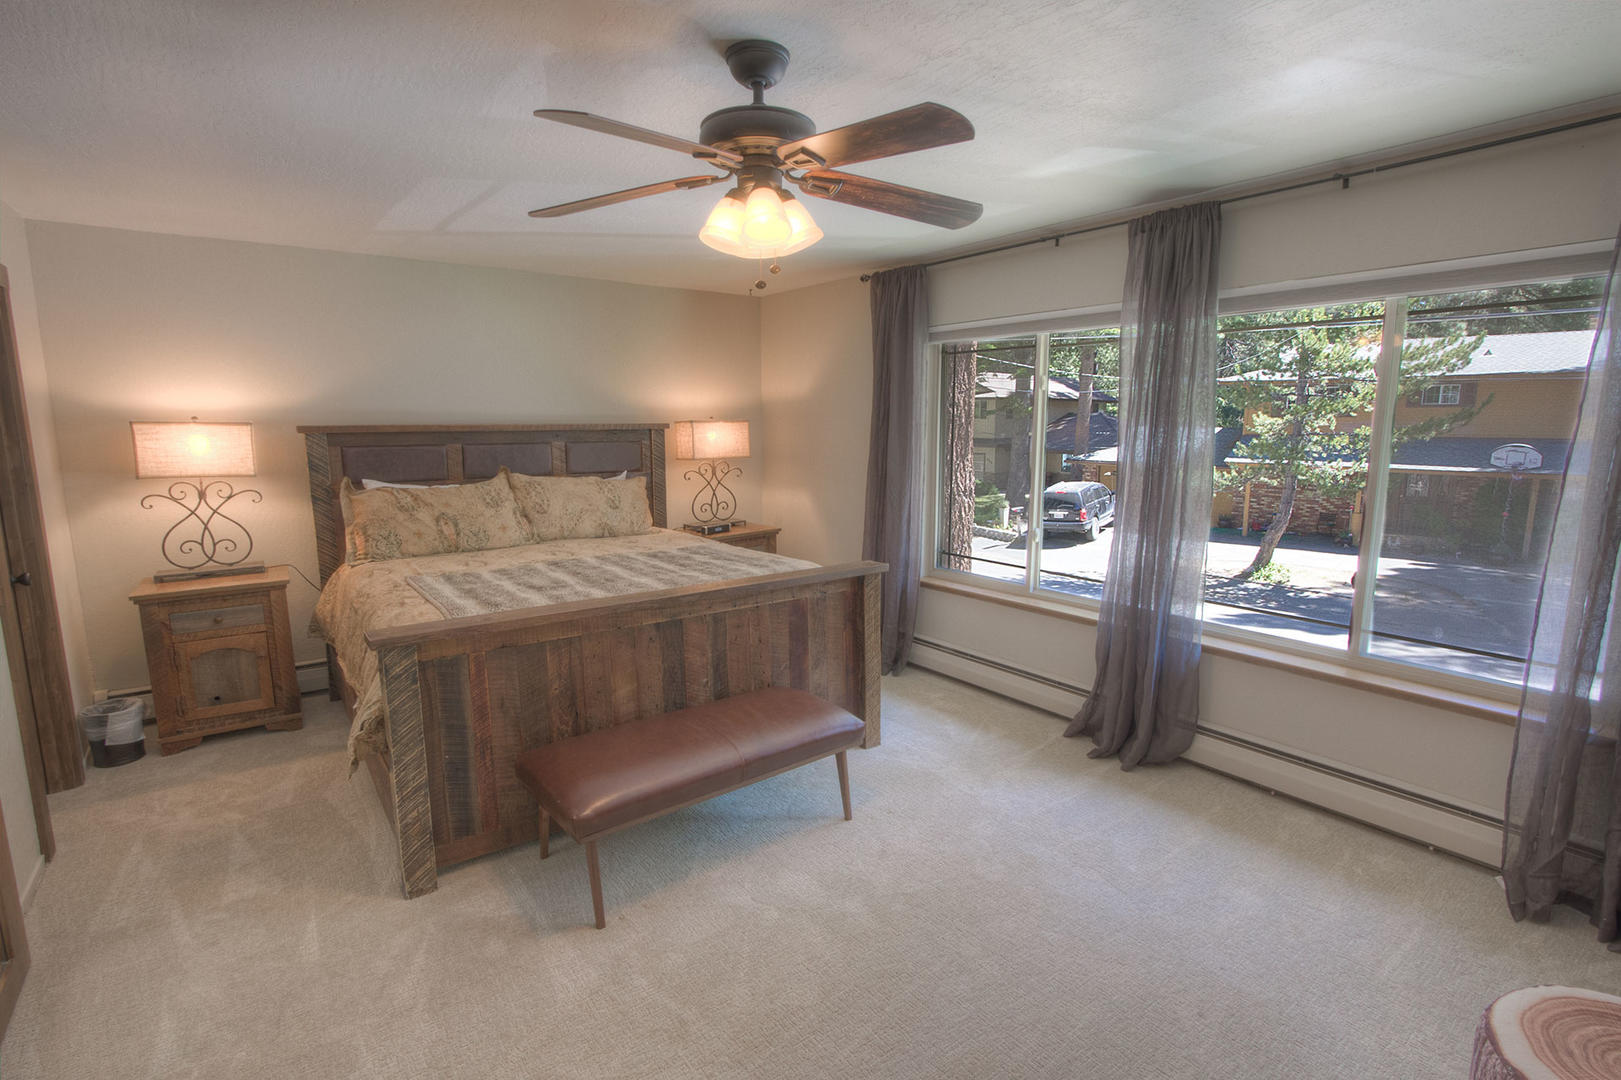 cyh1282 bedroom